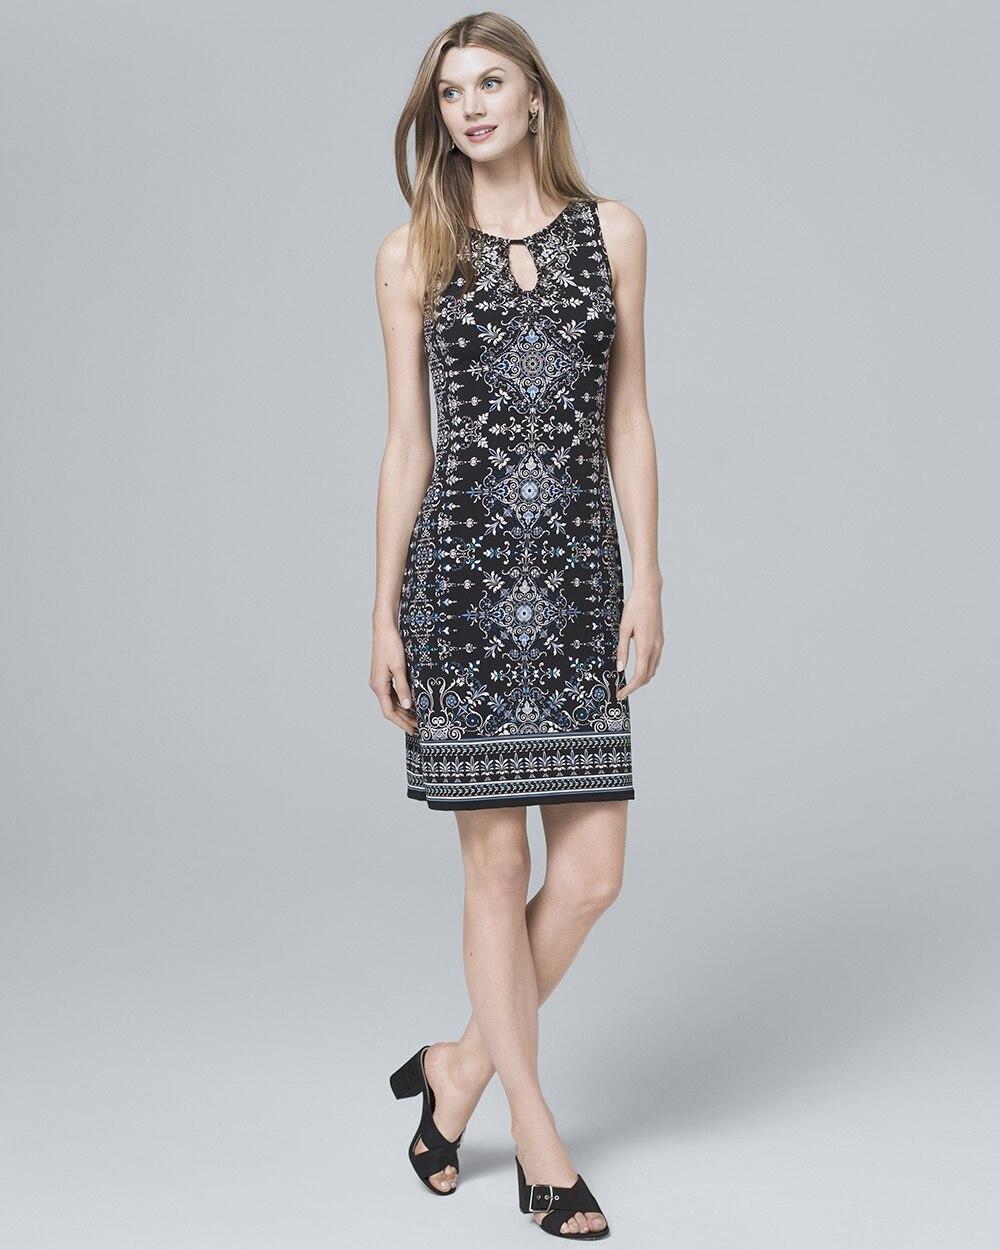 692fca9f38d9 Medallion-Print Knit Shift Dress - White House Black Market